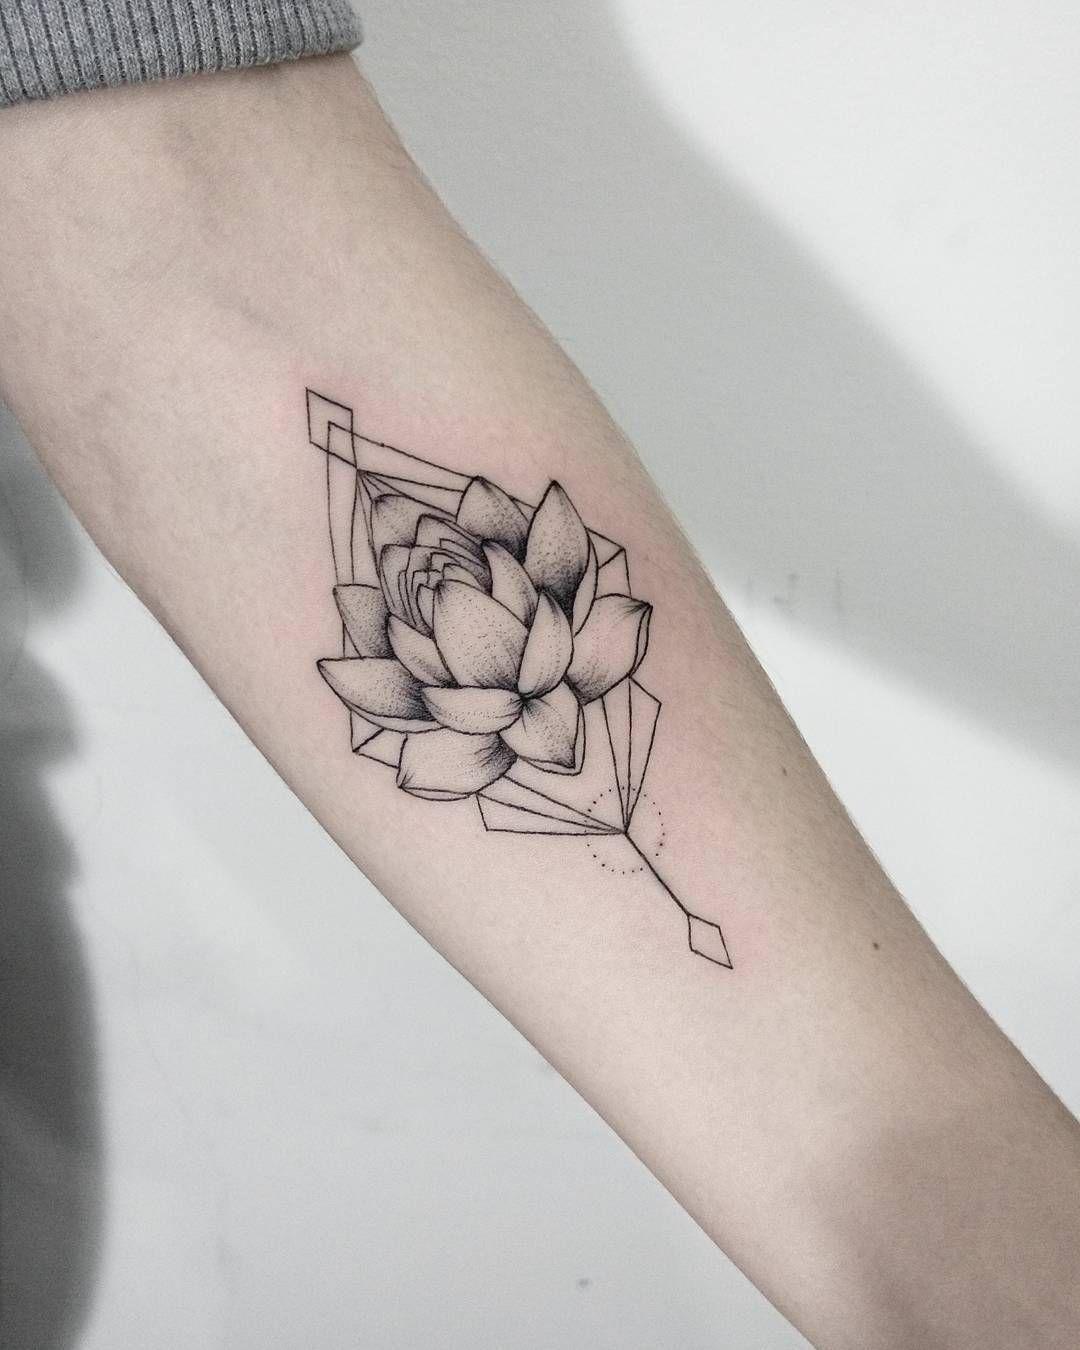 Tattoo st petersburg email sum tttyandex tattoo st petersburg email sum tttyandex sashatattooingstudio izmirmasajfo